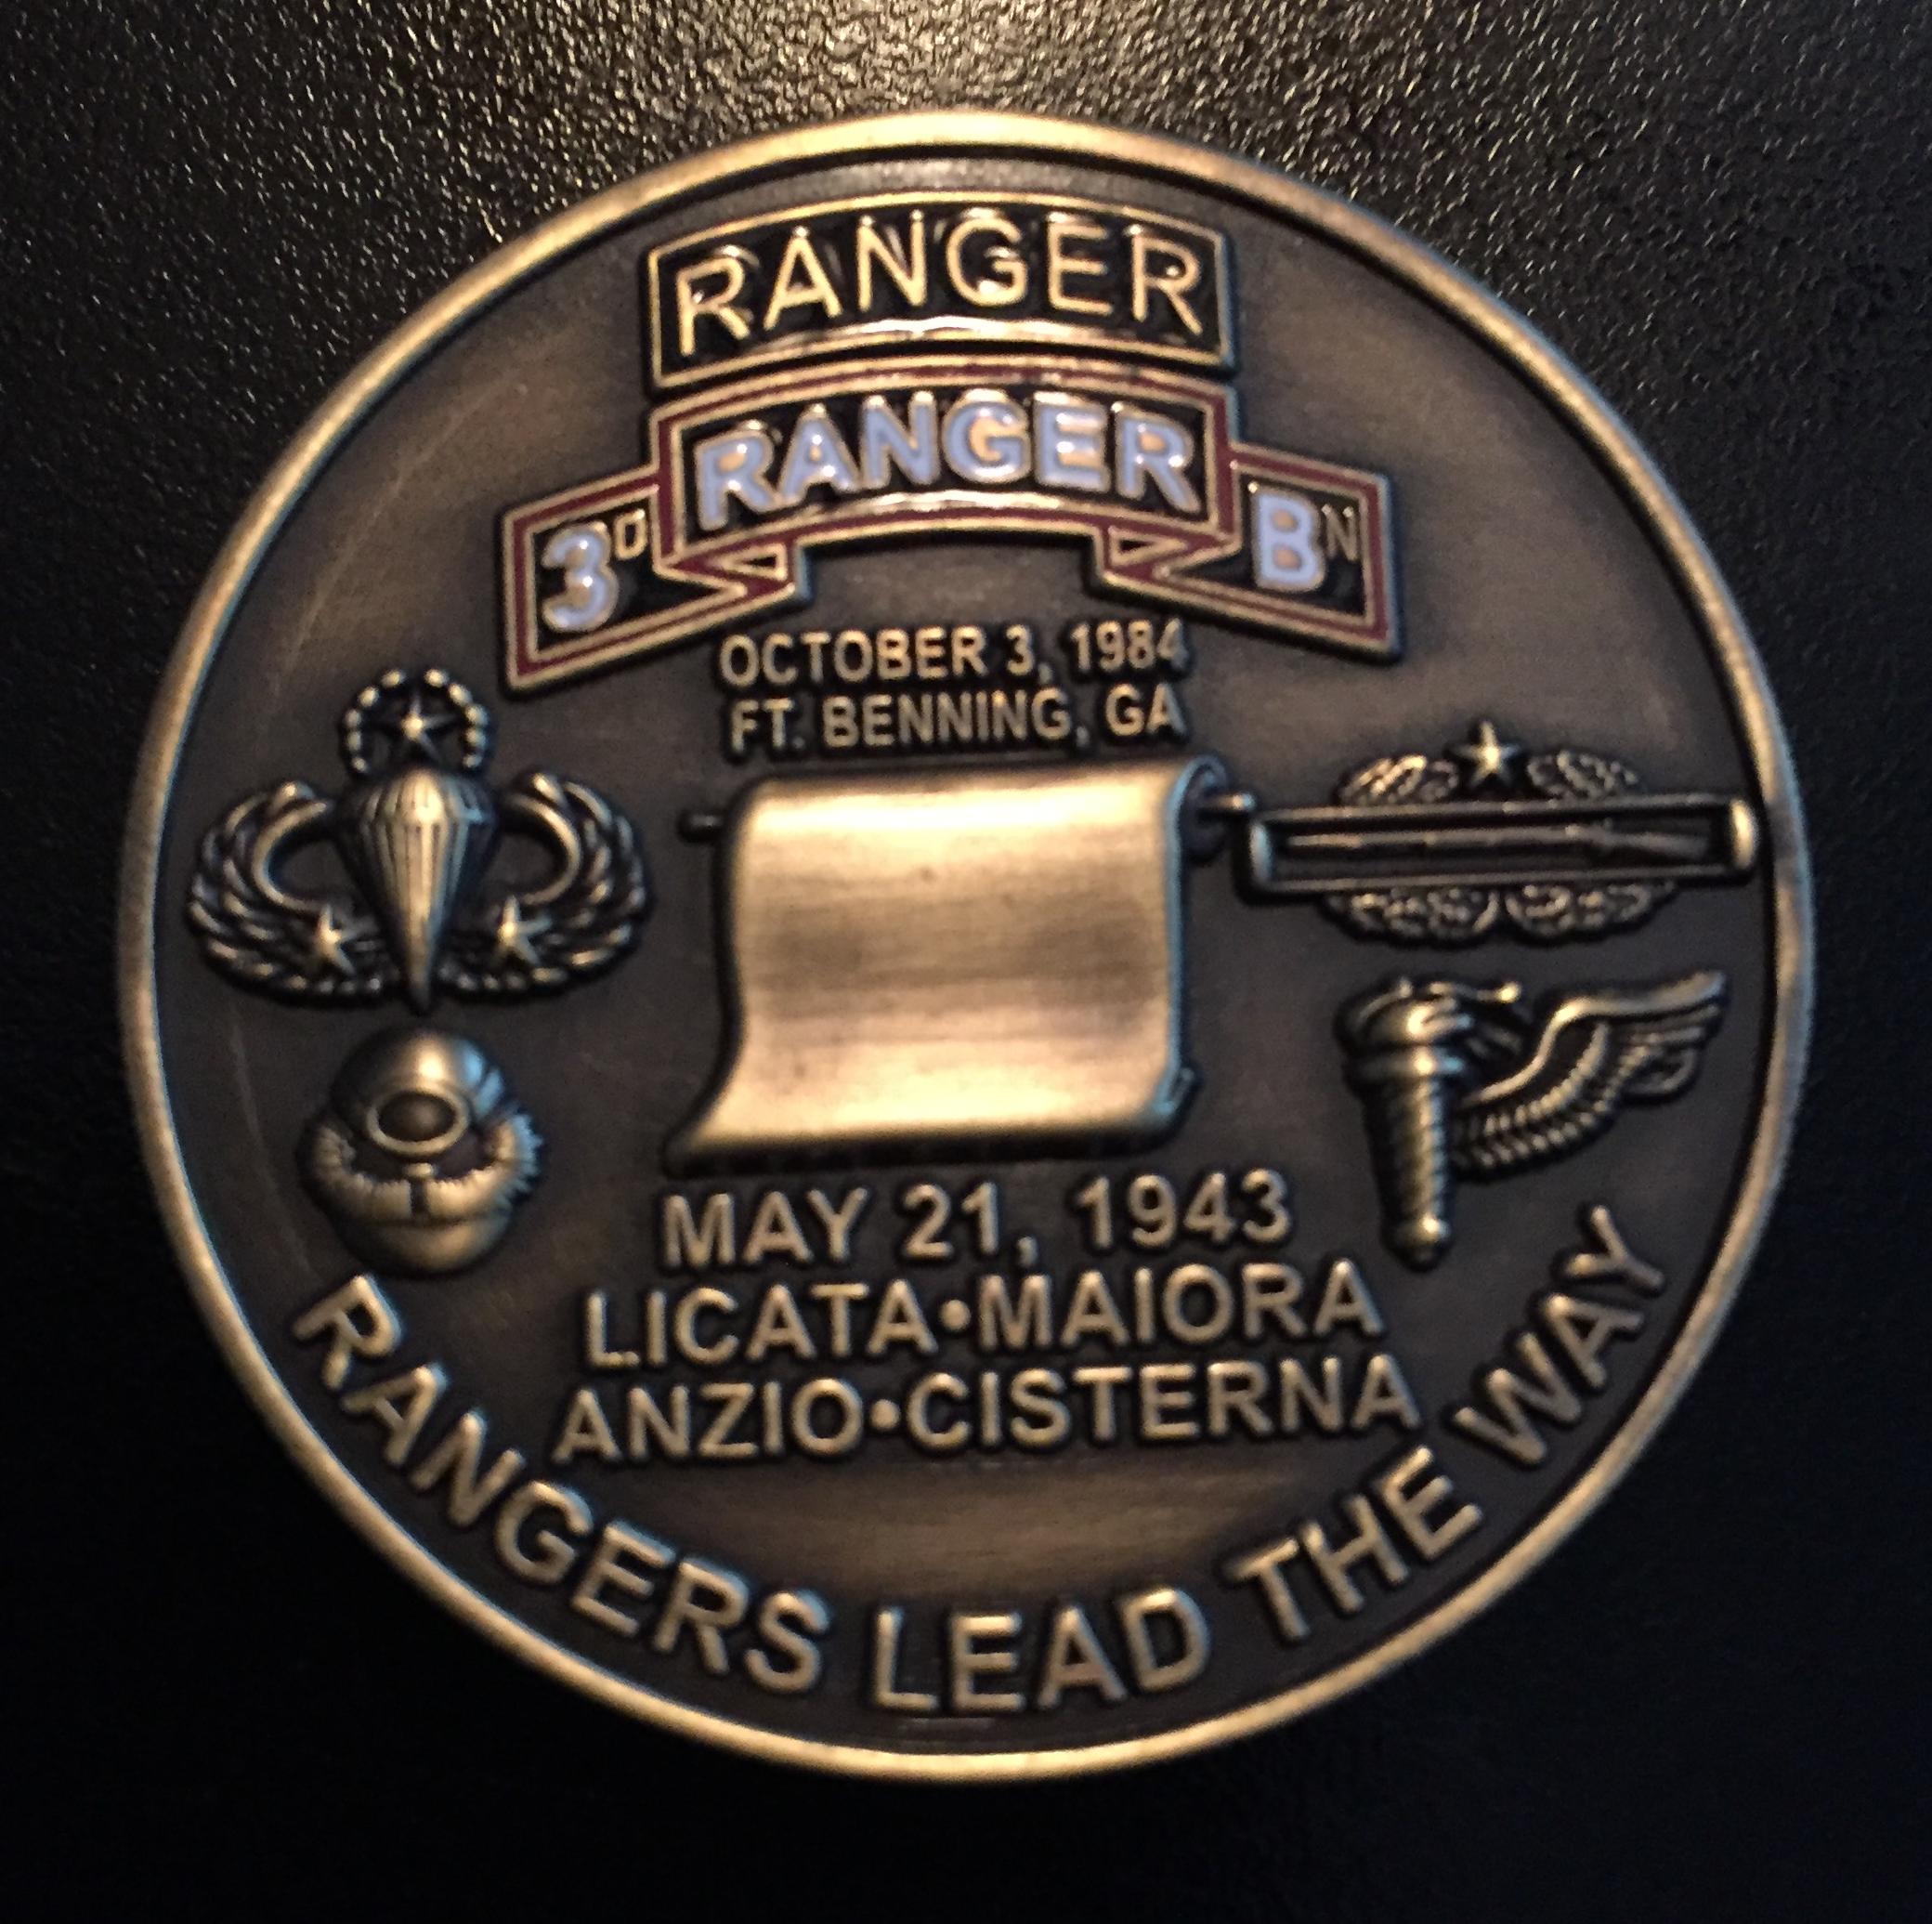 3rd Ranger Bn Challenge Coin